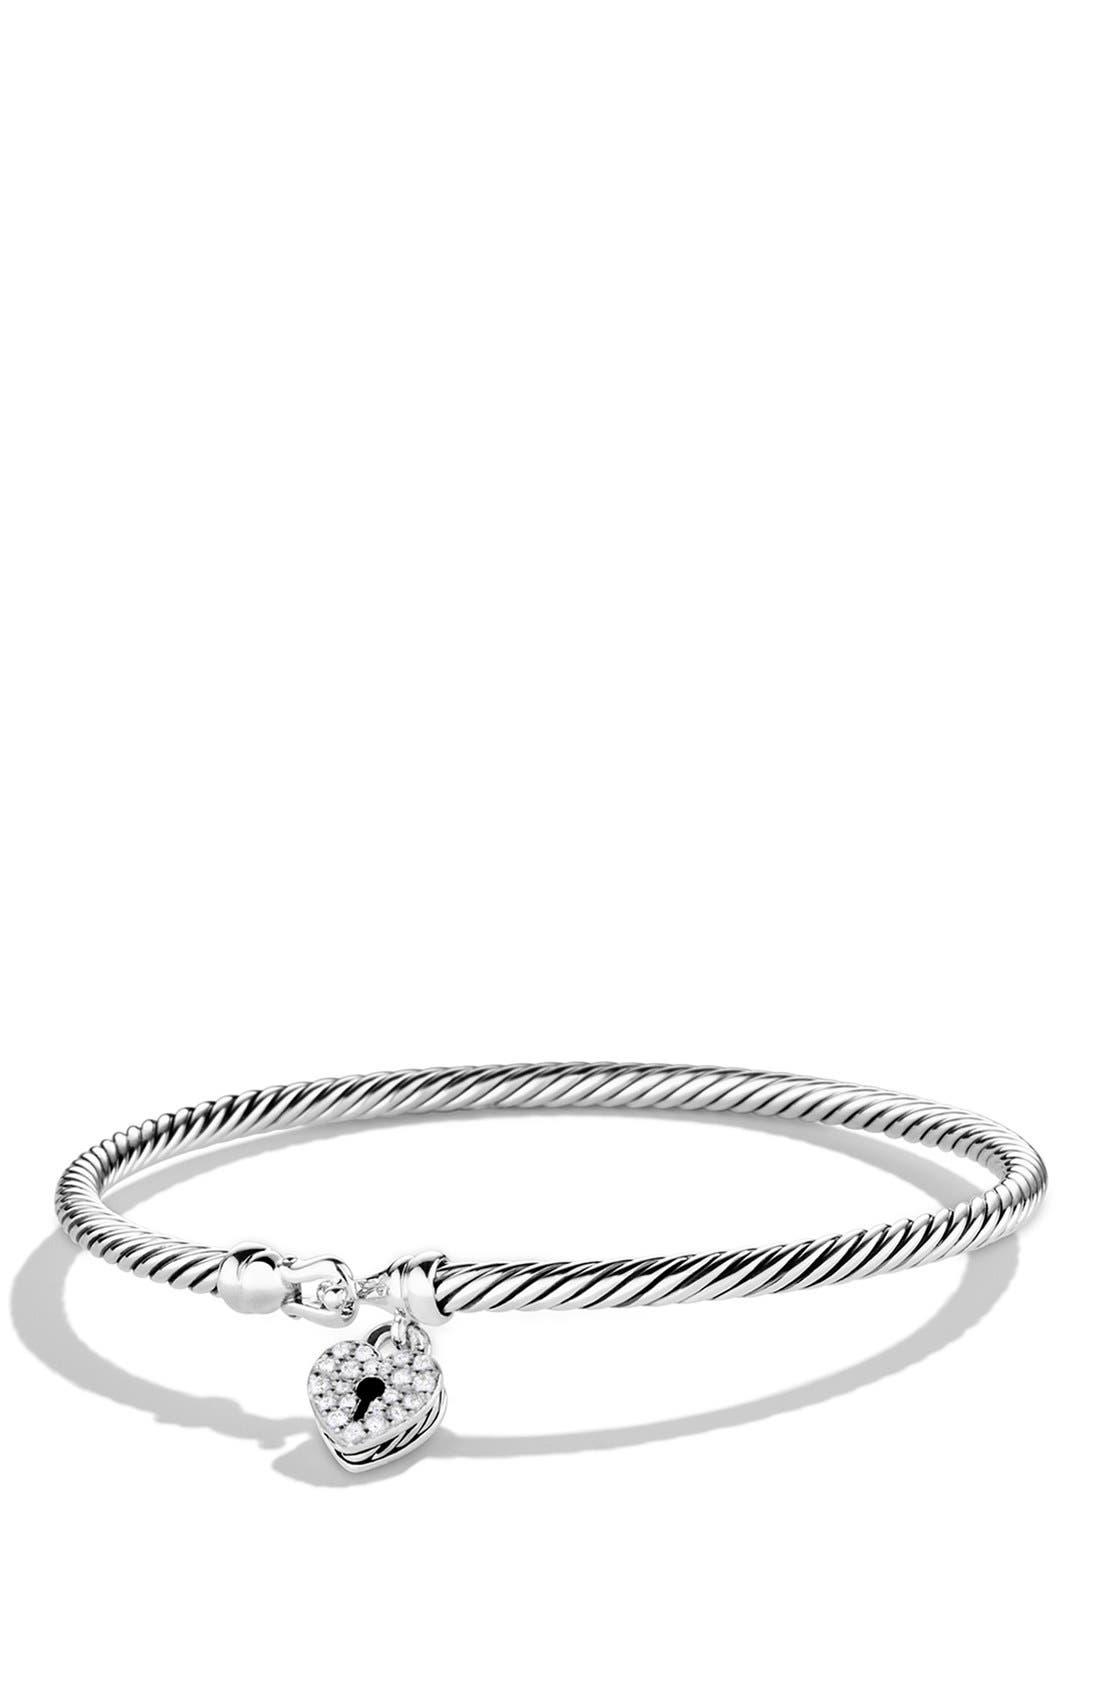 'Cable Collectibles' Heart Lock Bracelet with Diamonds,                             Main thumbnail 1, color,                             Diamond